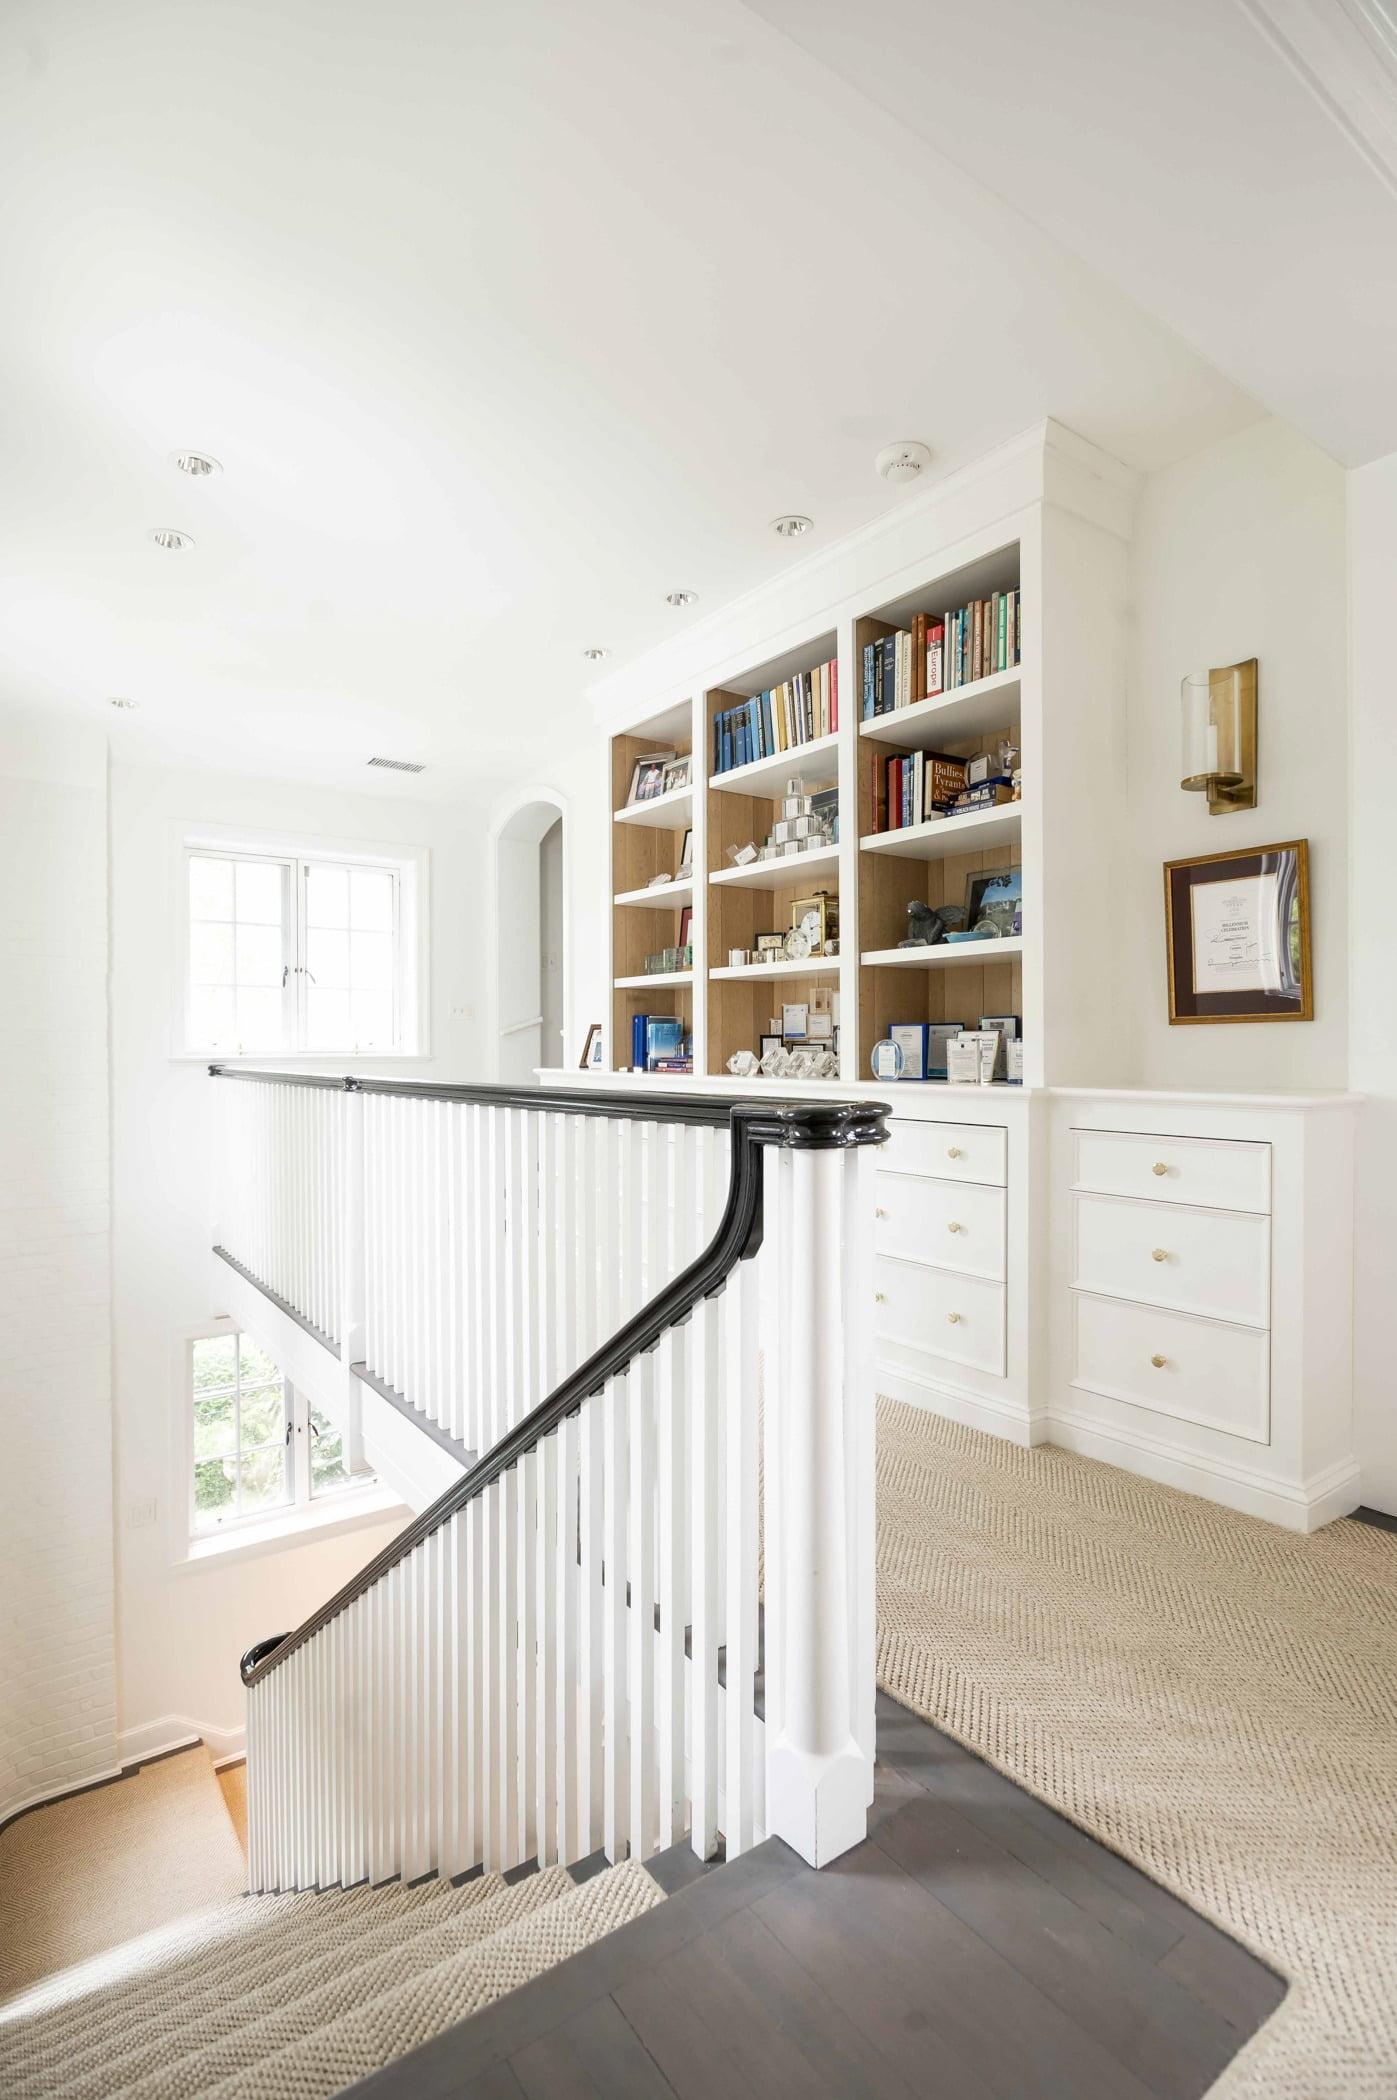 Transitional upstairs hallway, dark hardwood flooring with beige carpet, black and white wood railings